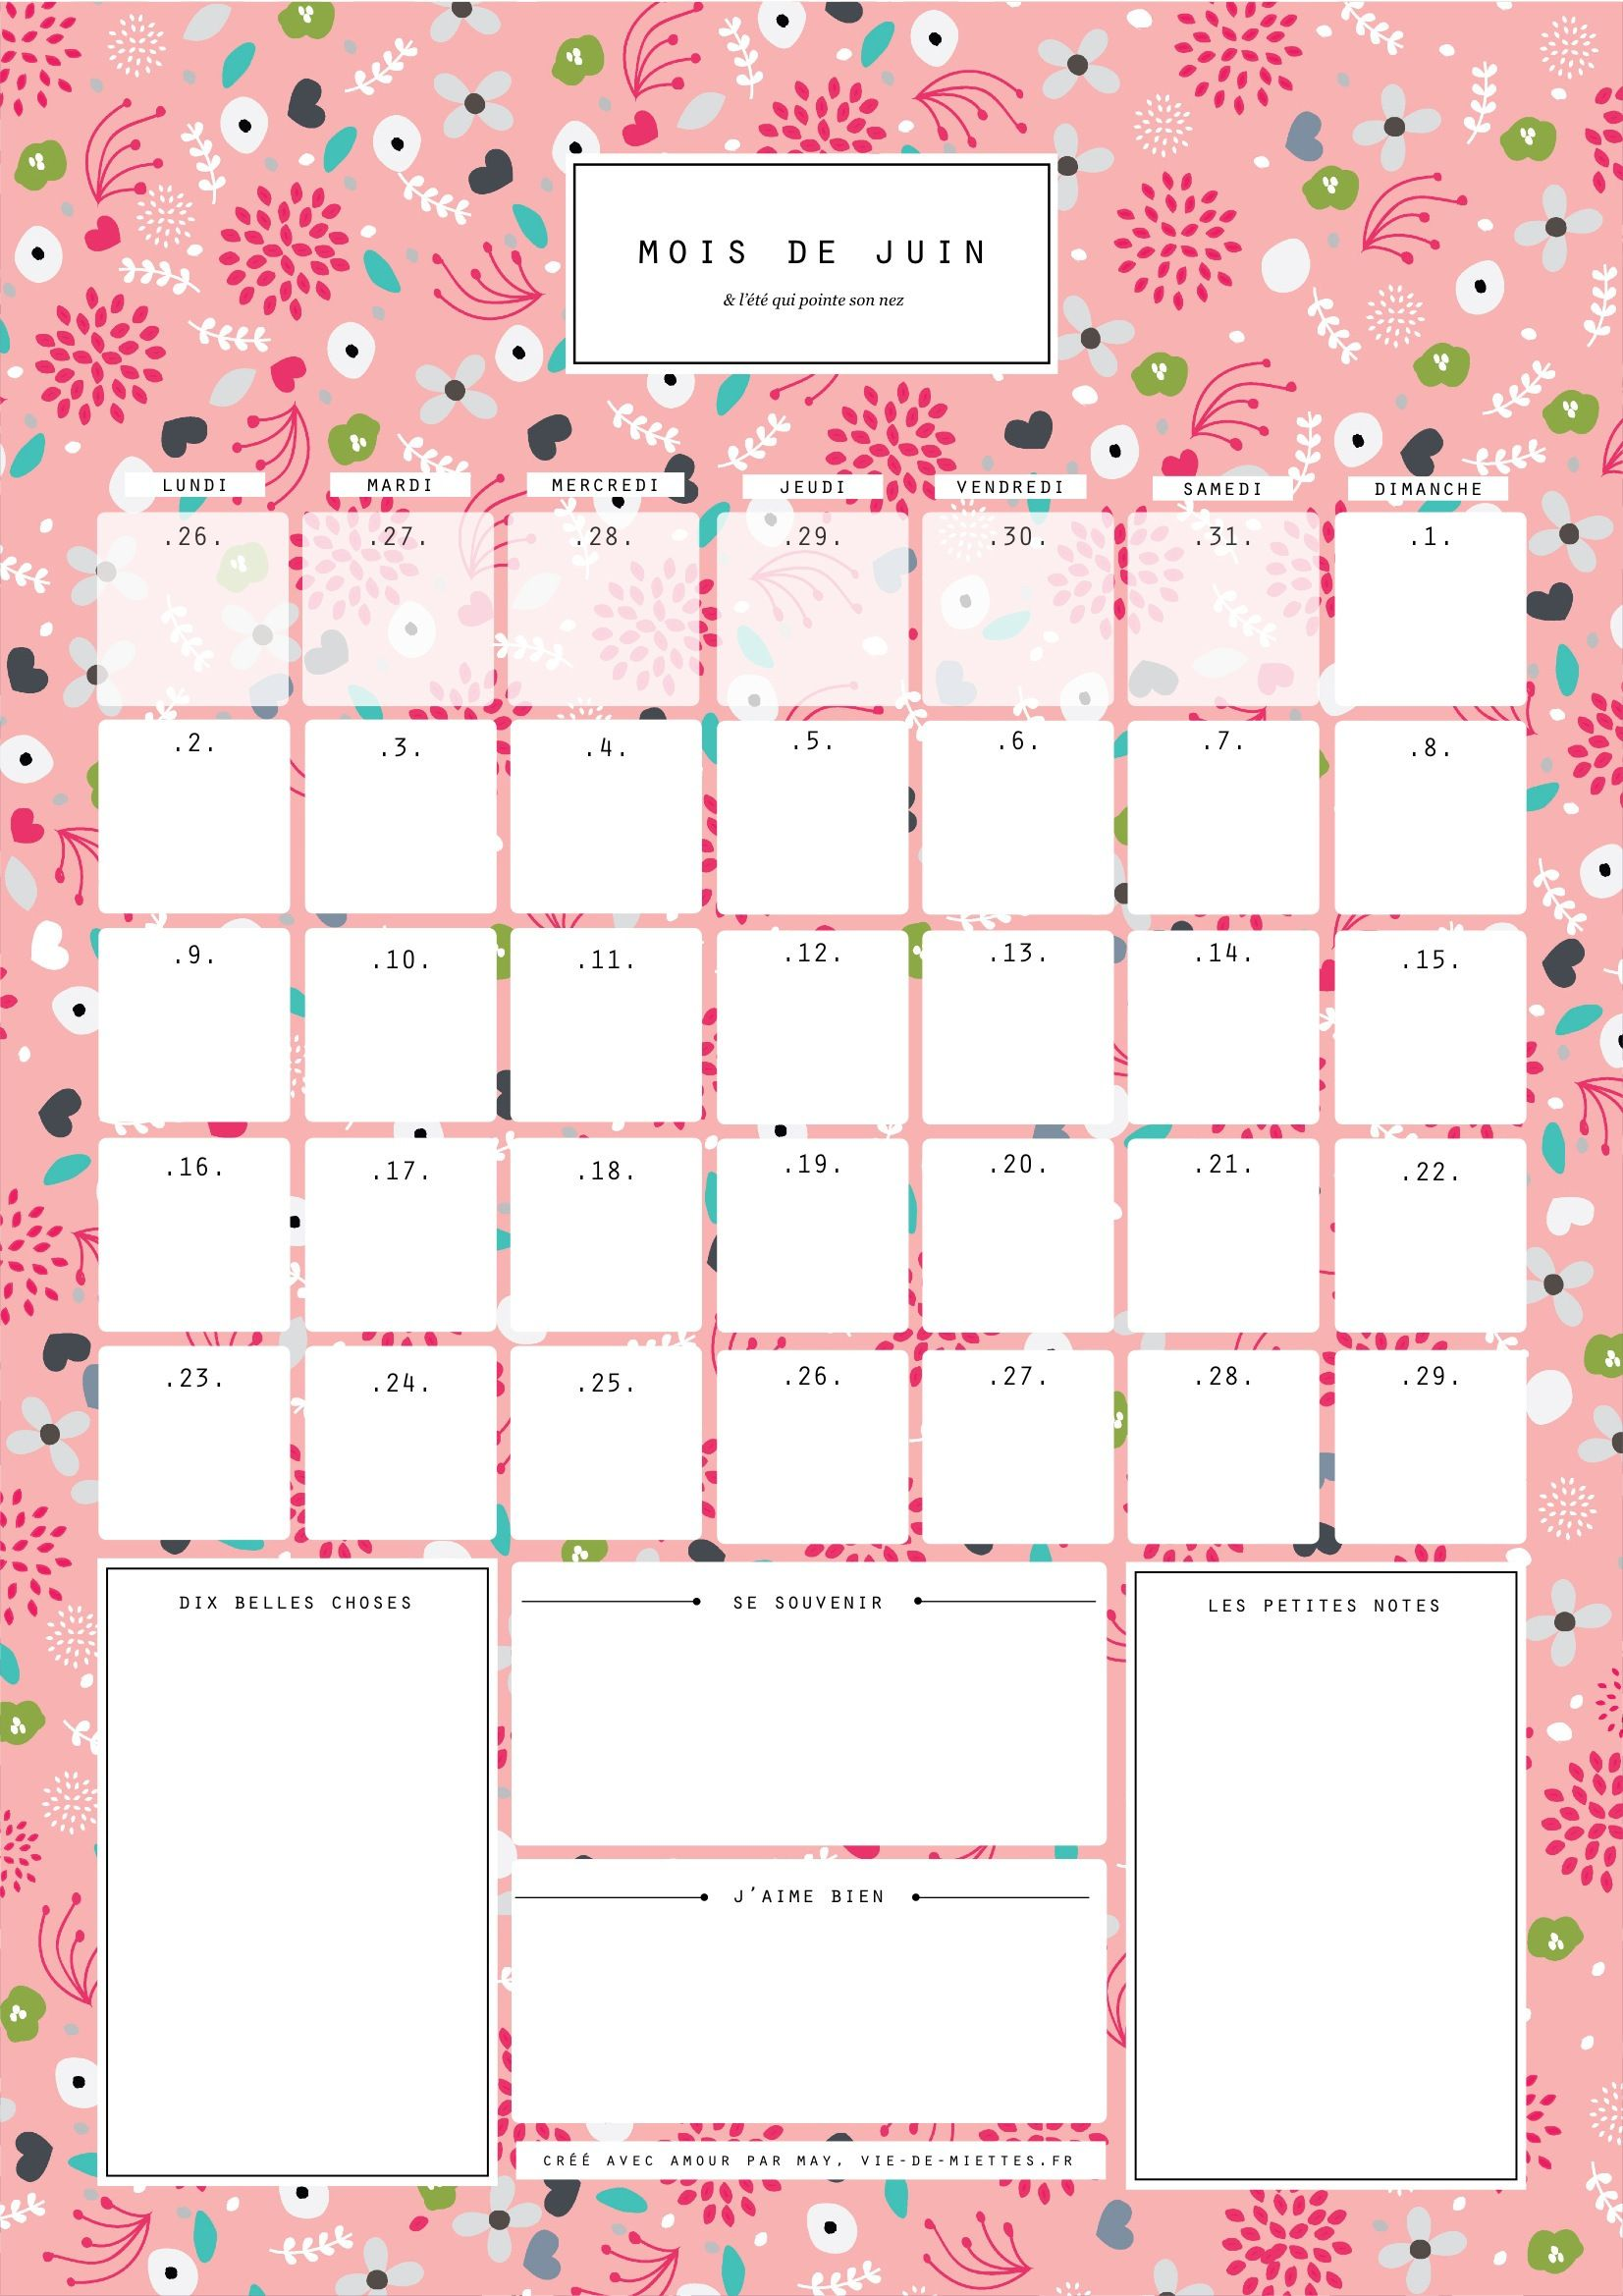 Calendrier mensuel 2016 à imprimer pdf